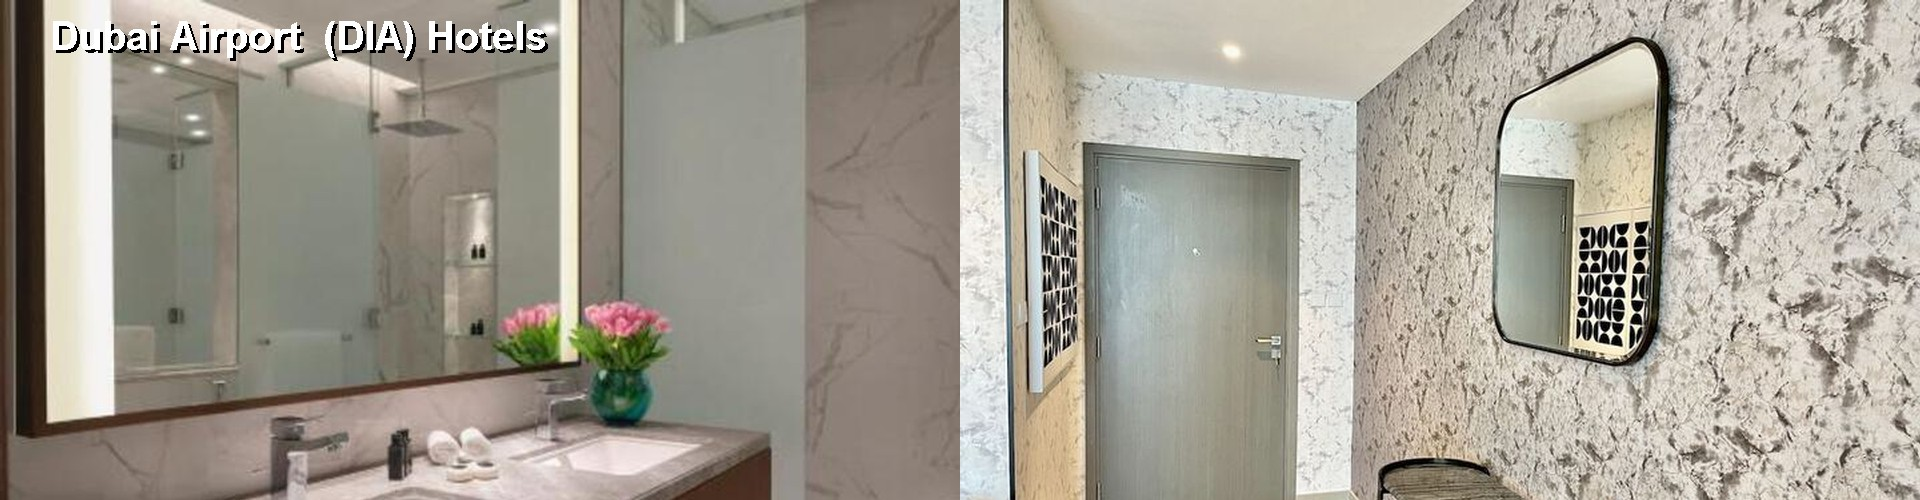 5 Best Hotels Near Dubai Airport Dia